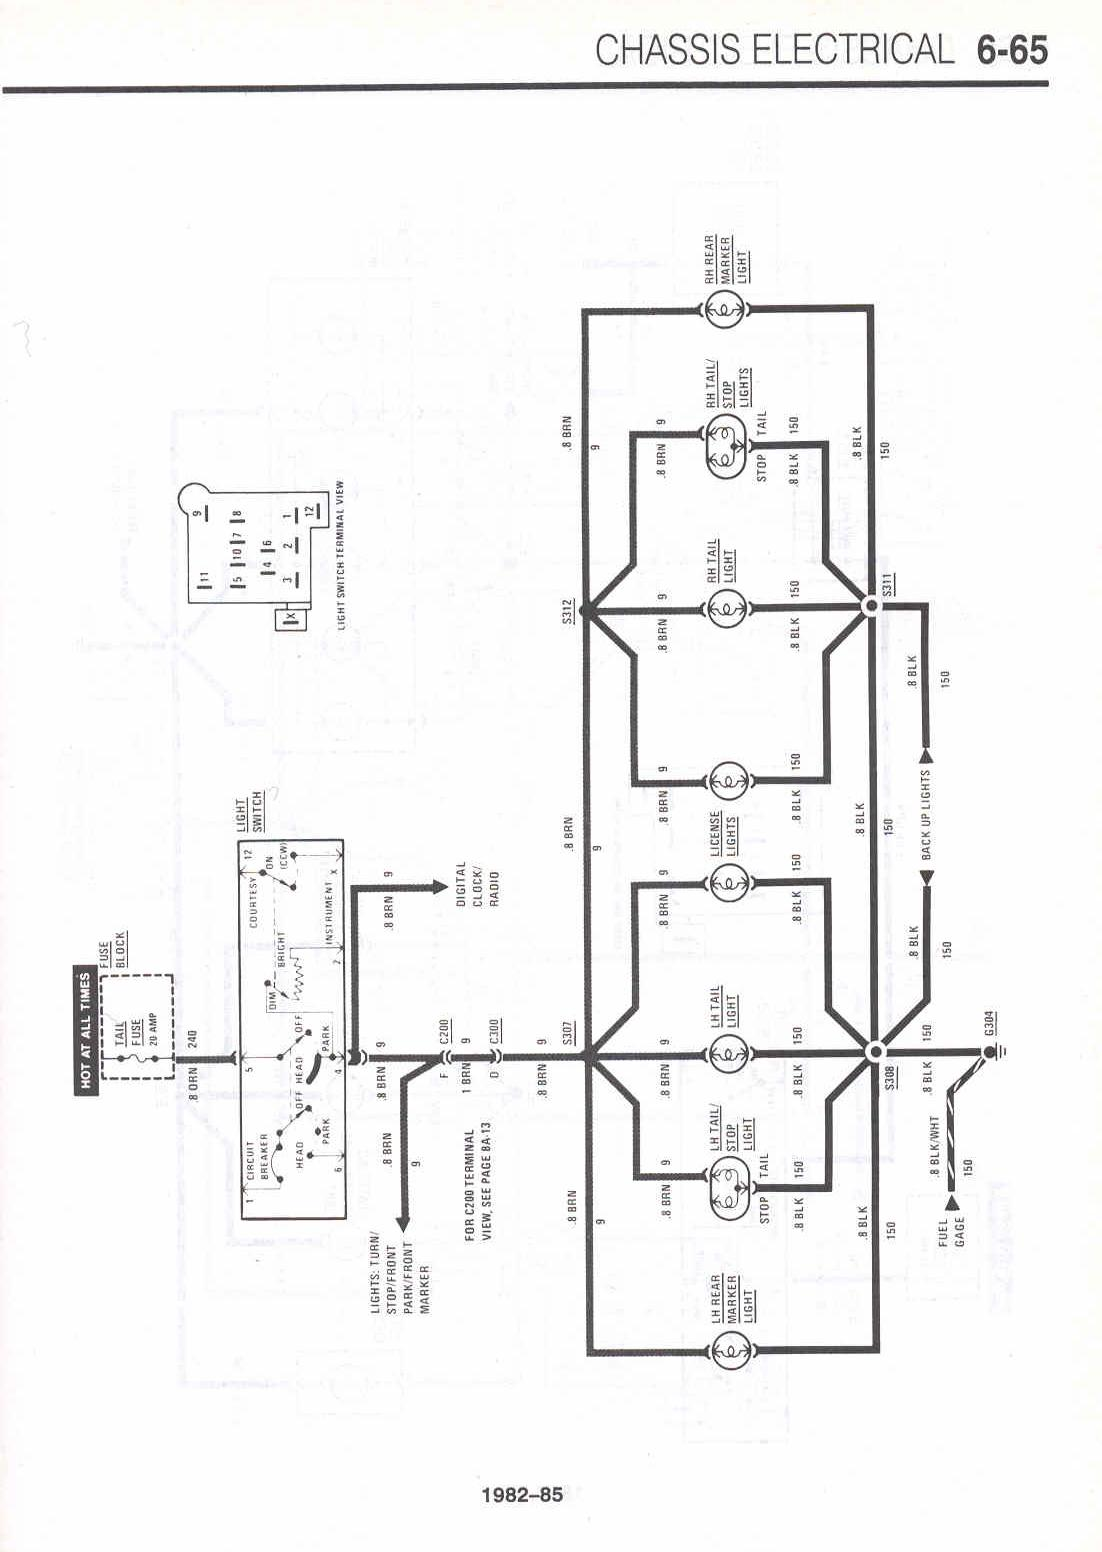 Camaro Alternator Wiring Diagram